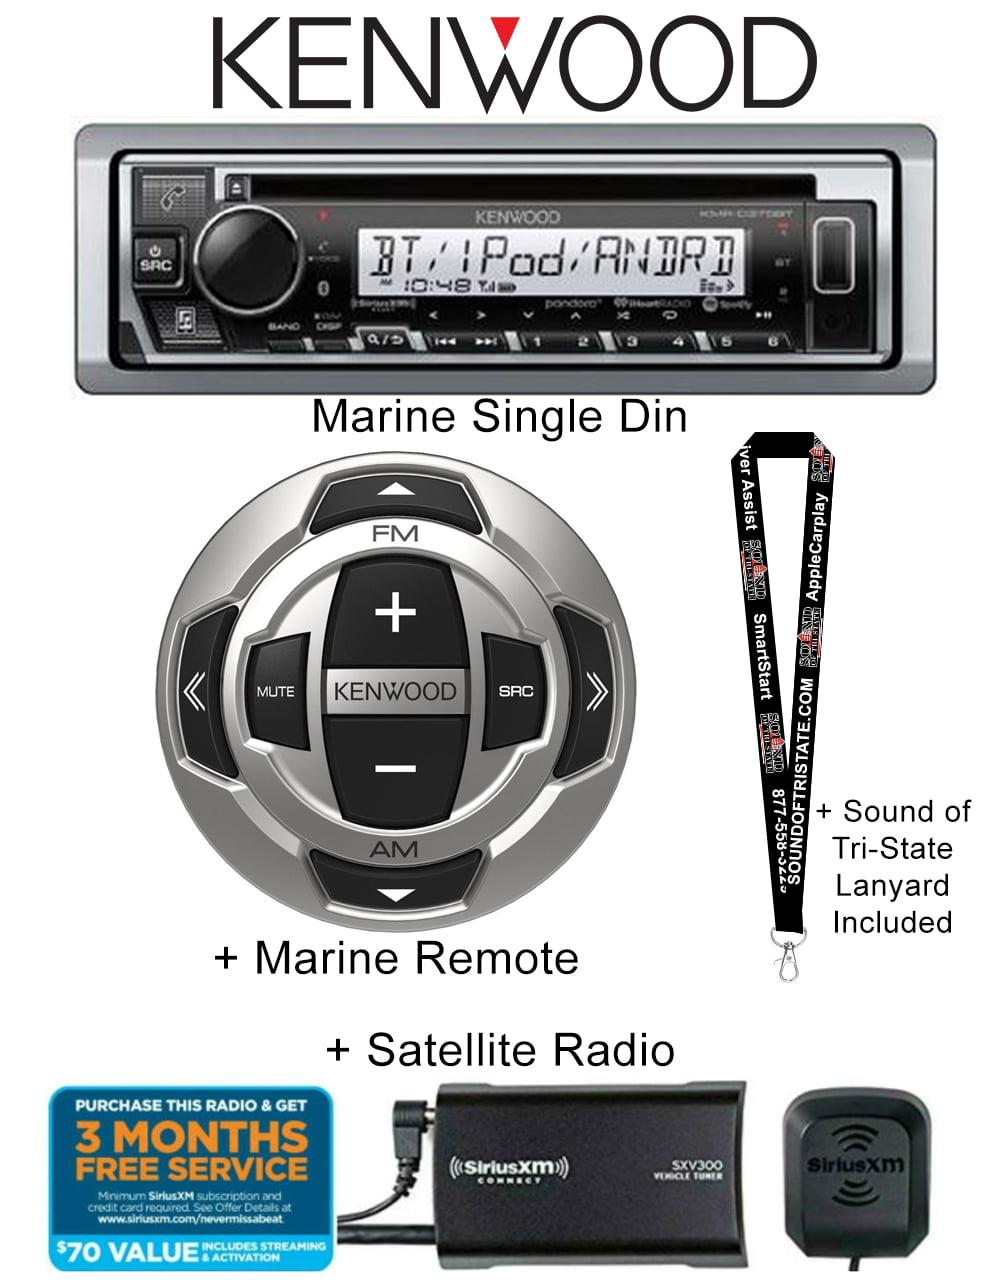 Wired Remote Kenwood Marine Digital Media Bluetooth Receiver